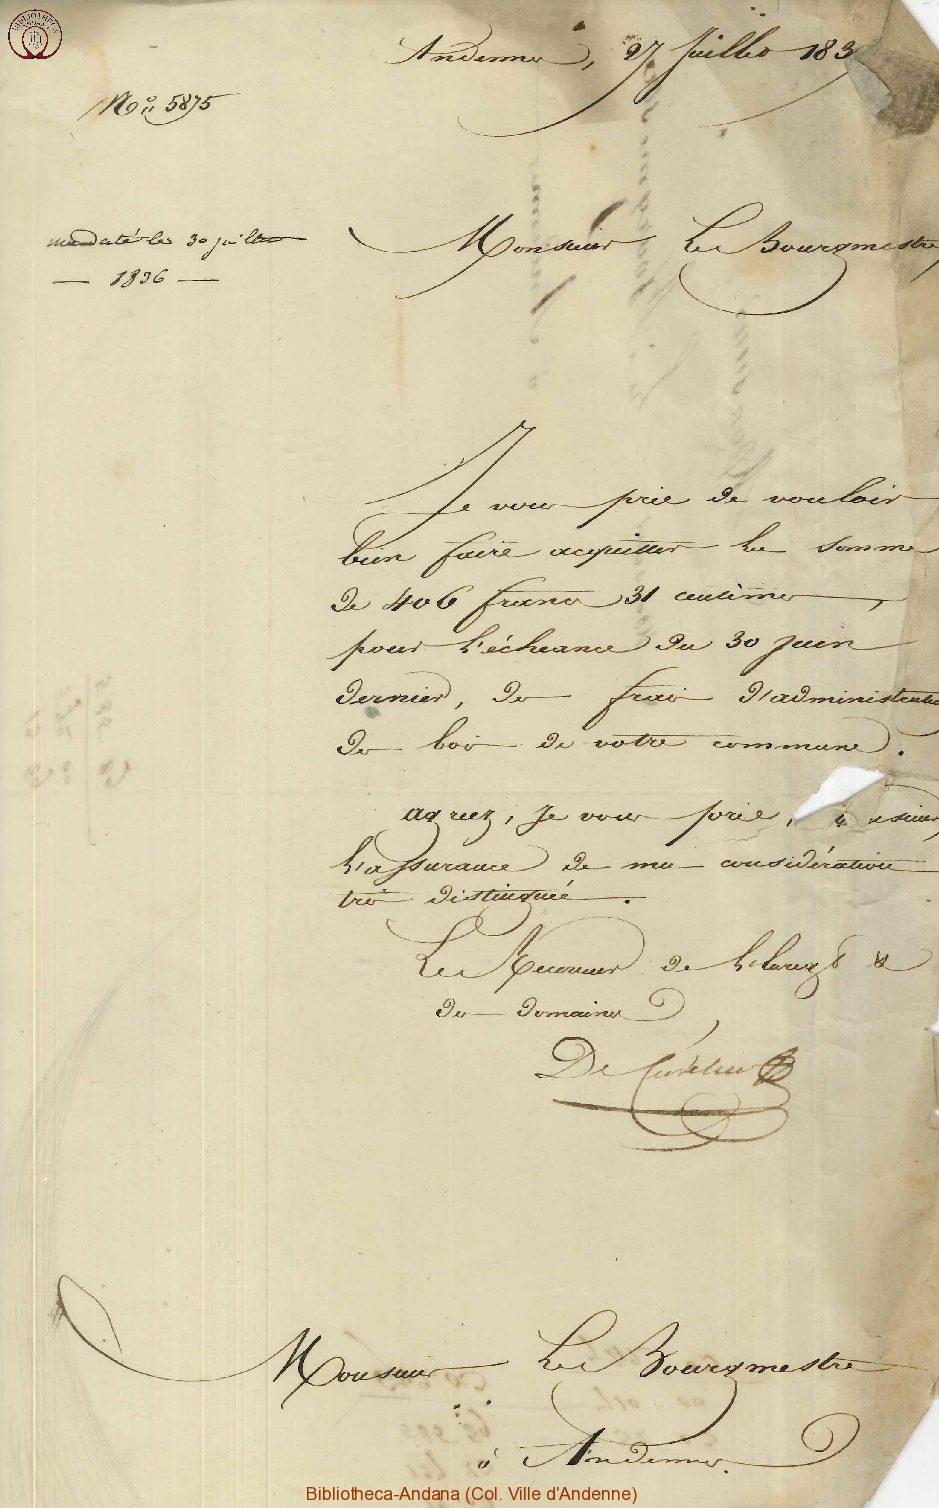 1836-07-27